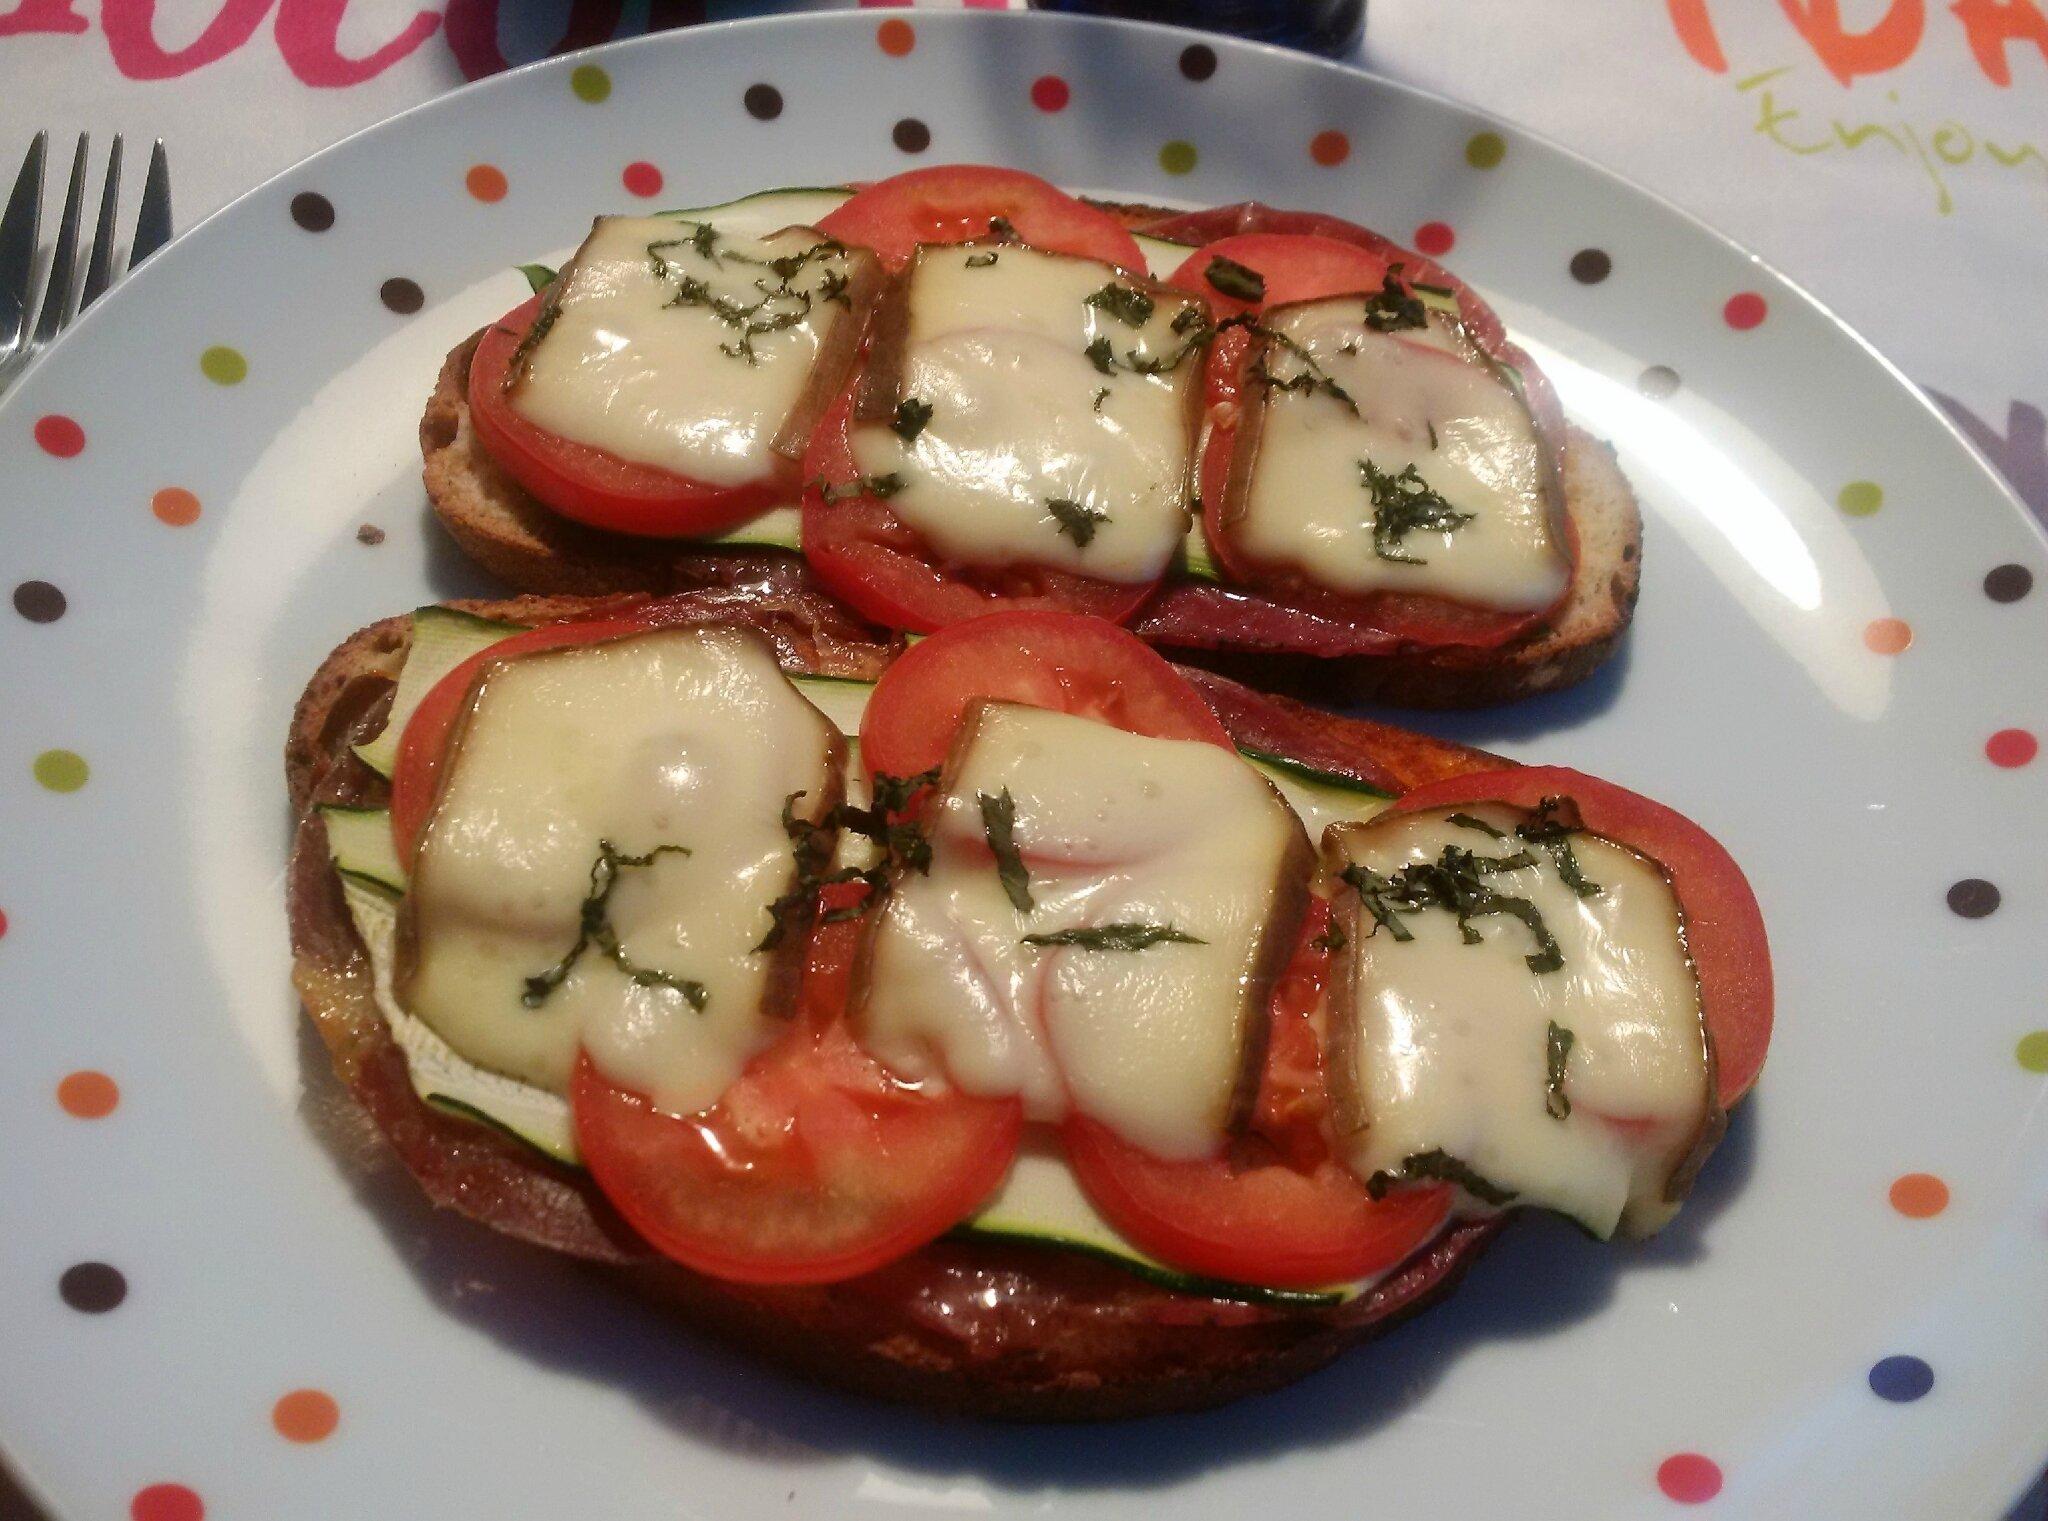 Bruschetta à la Trappe d'Echourgnac (avec jambon cru, courgette, tomates, pesto rosso, basilic)